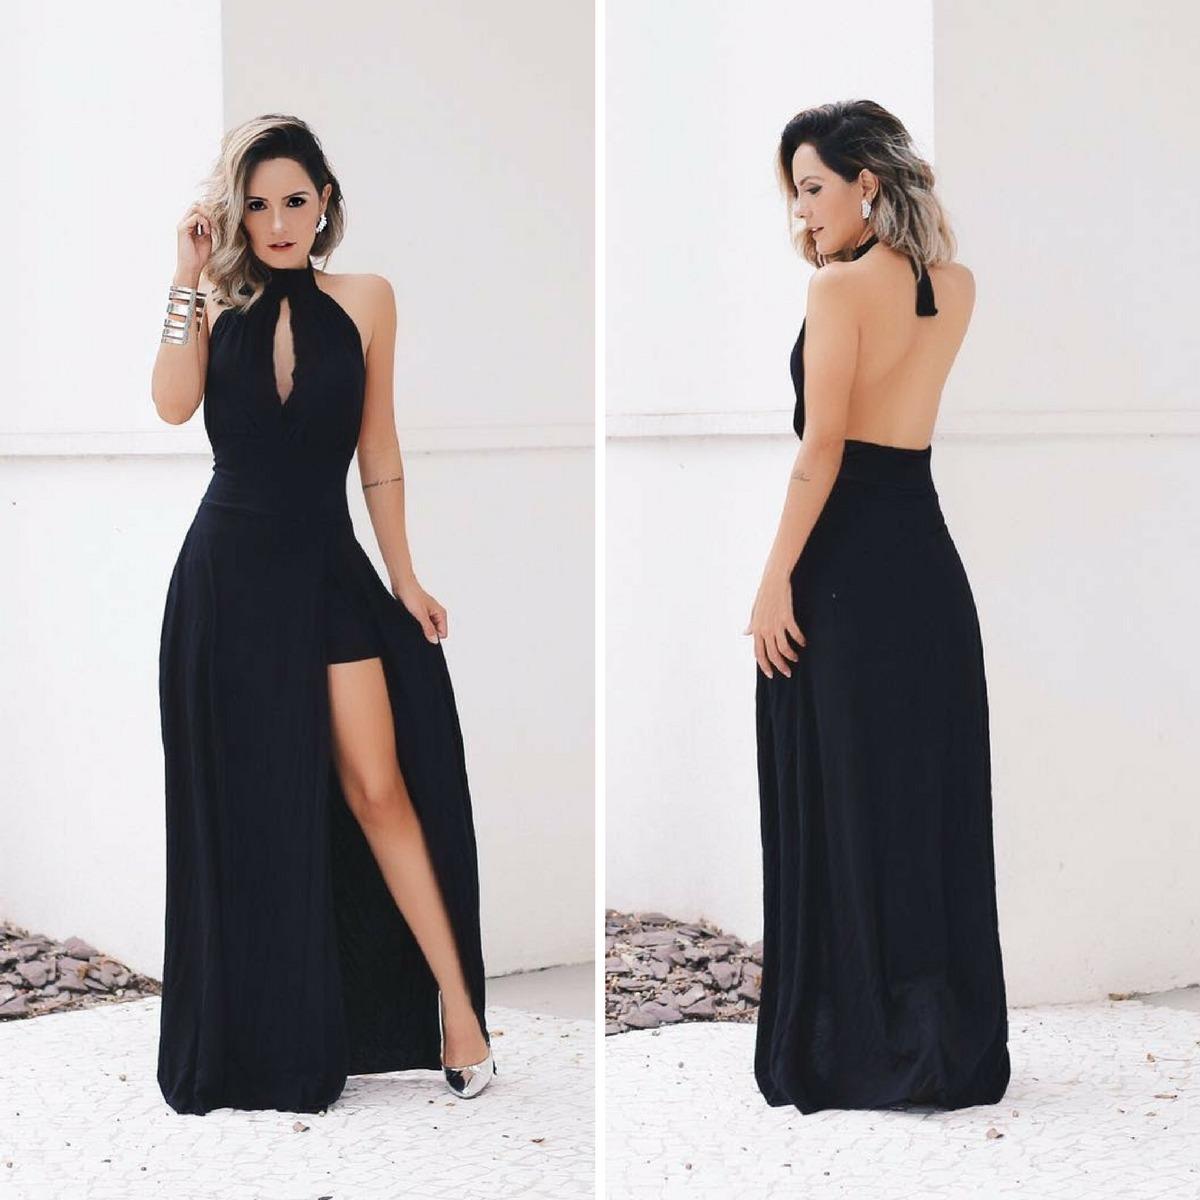 Vestido preto longo barato